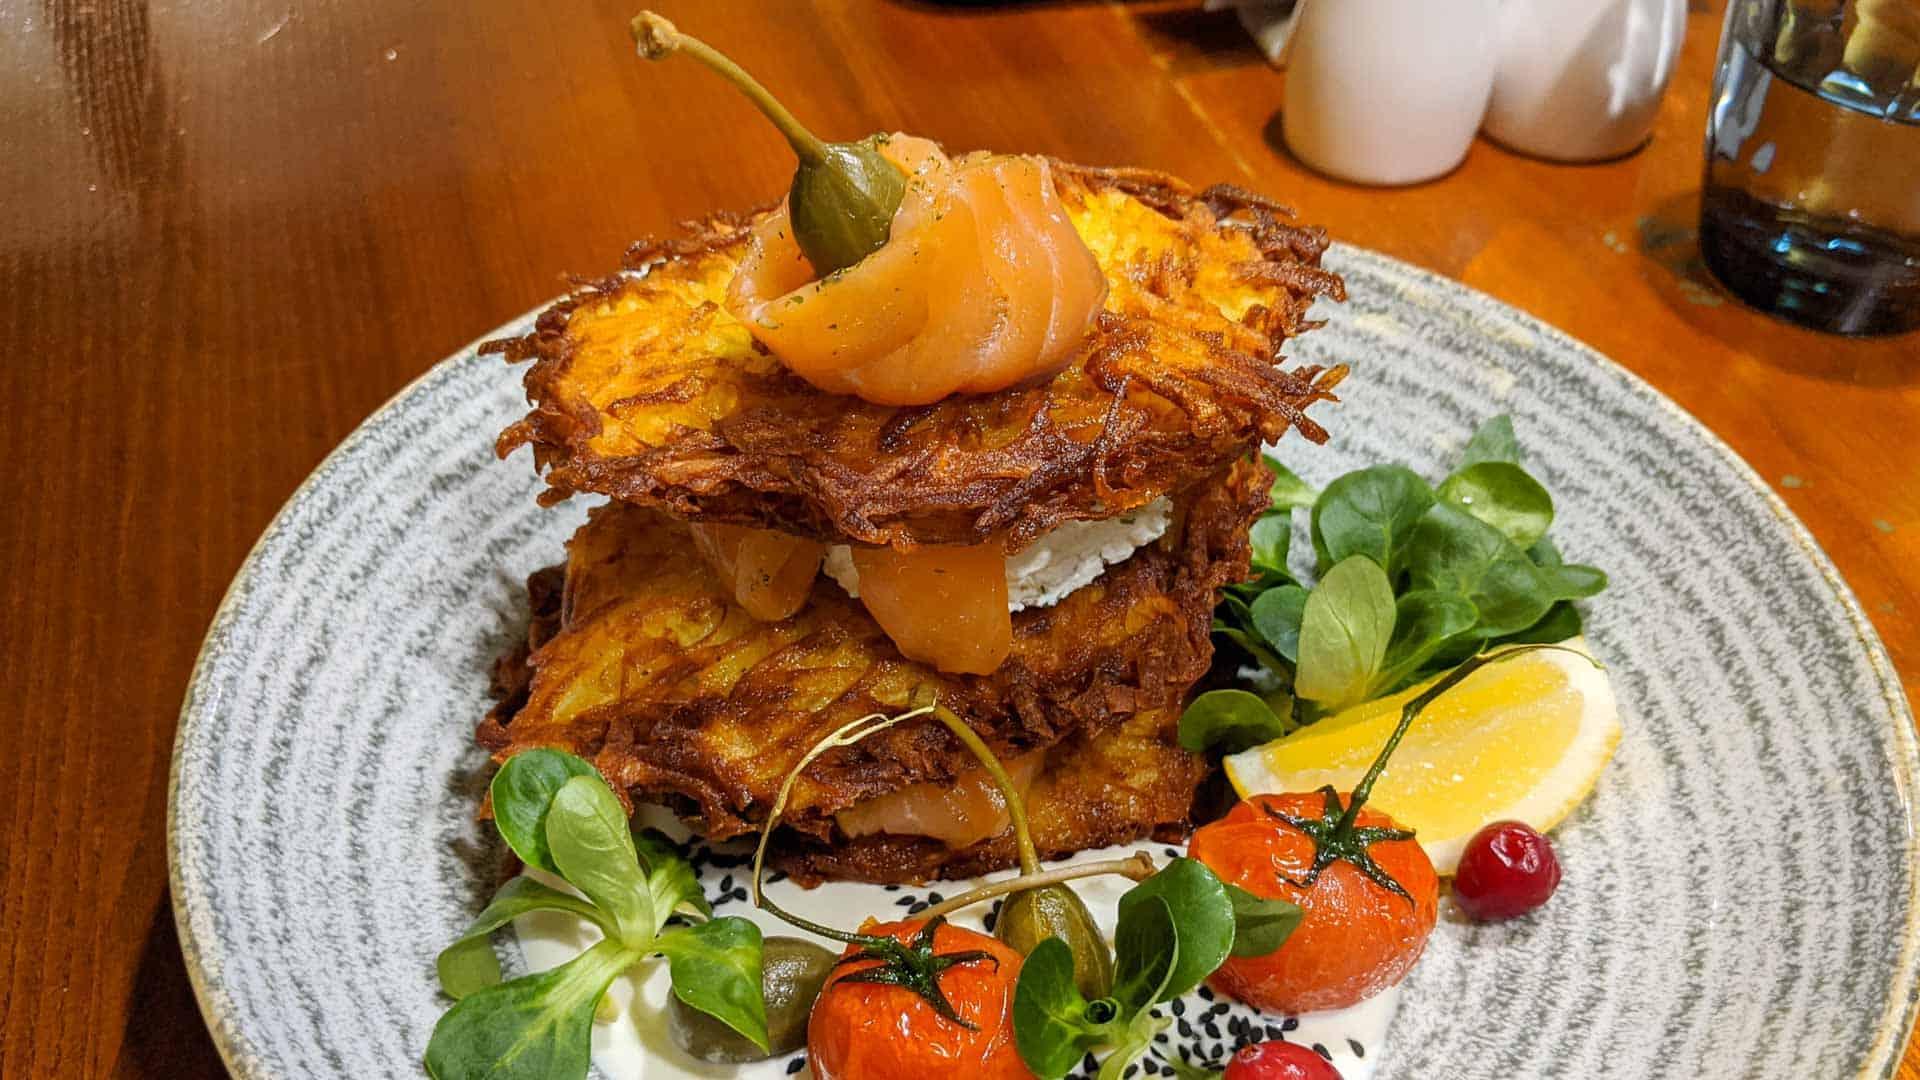 Potato pancakes with smoked salmon